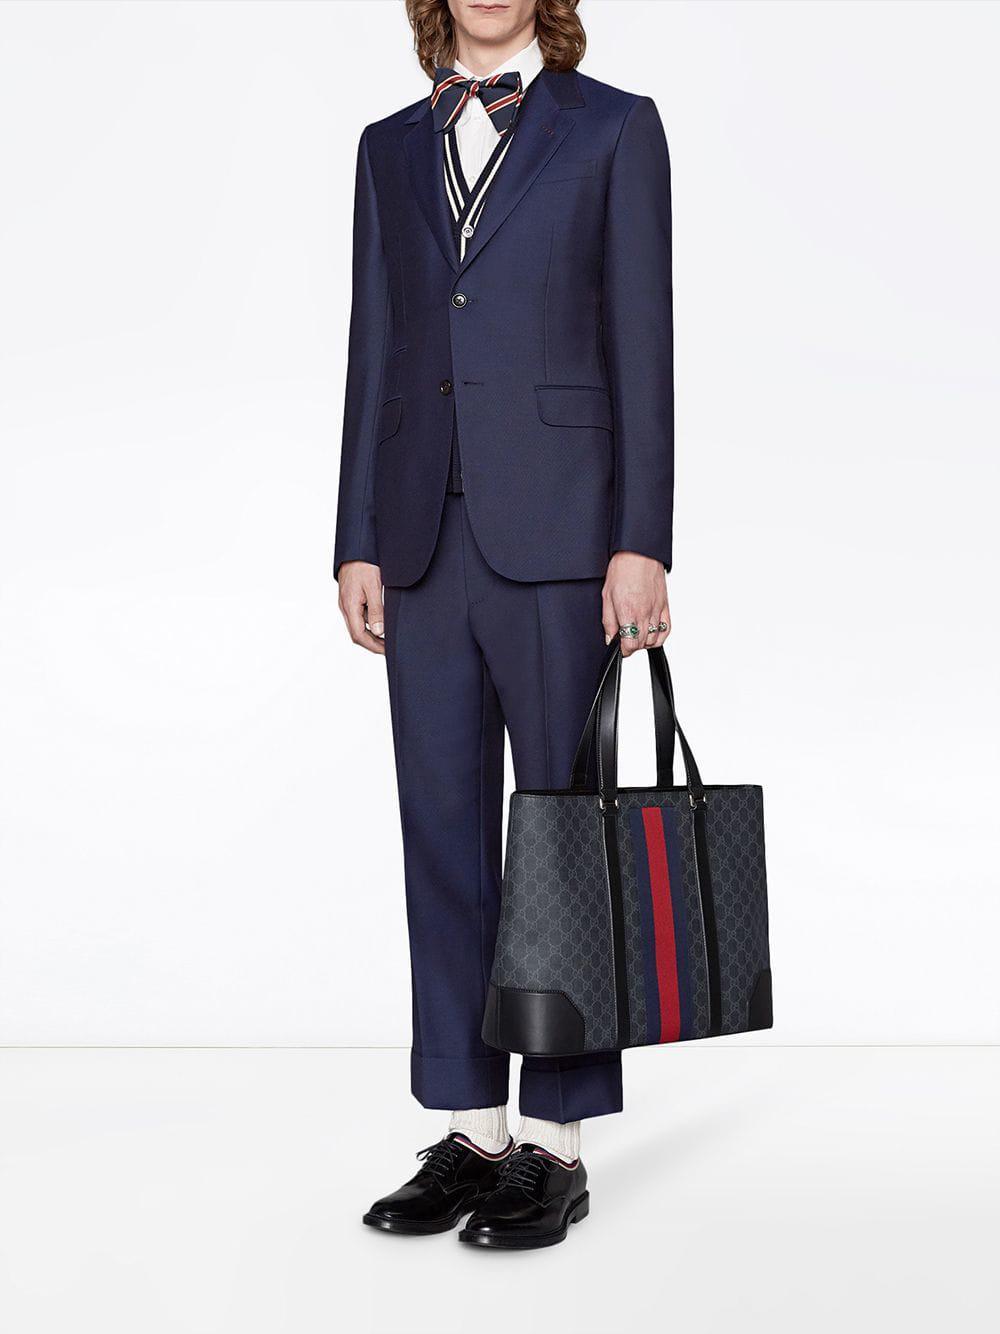 7f93a2f4f0e12e Gucci GG Supreme Tote in Black for Men - Save 12% - Lyst